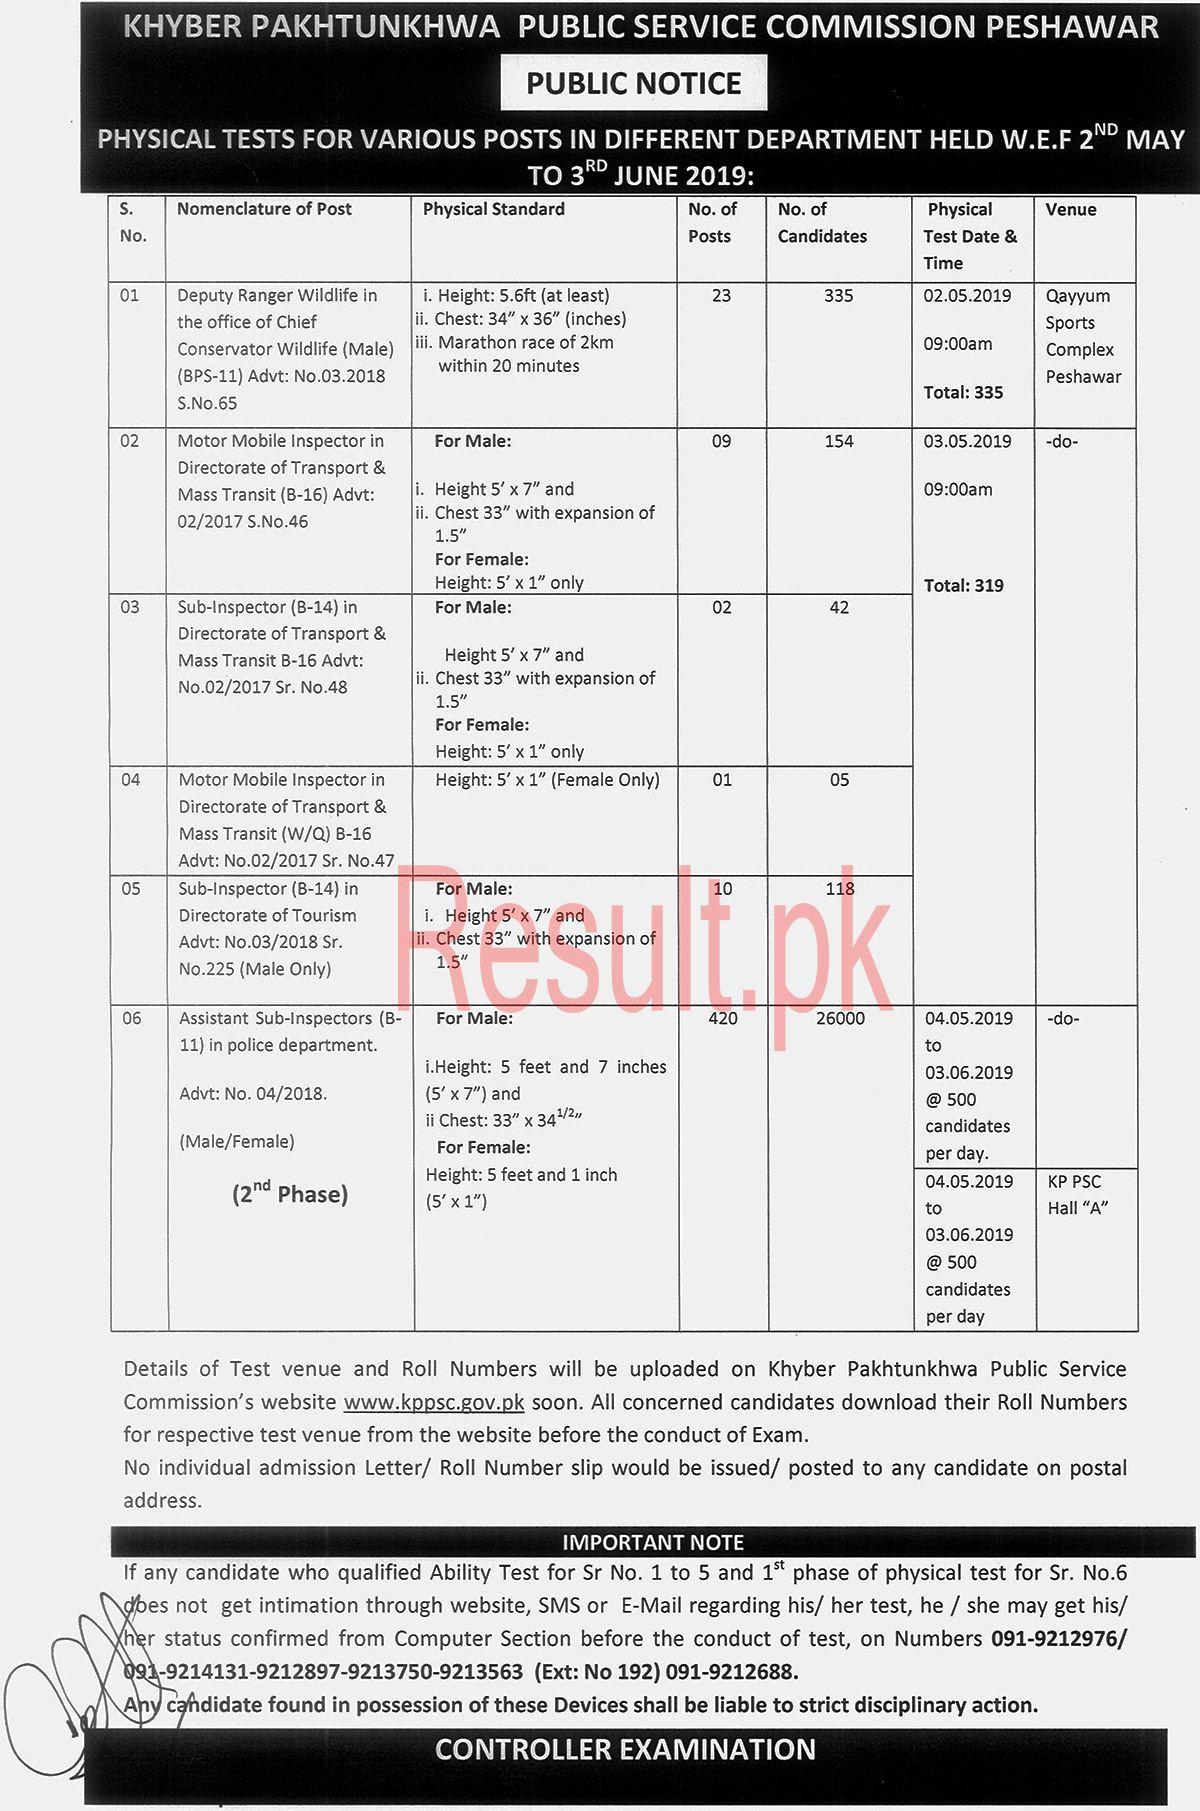 Khyber Pakhtunkhwa Public Service Commission Date Sheet 2019